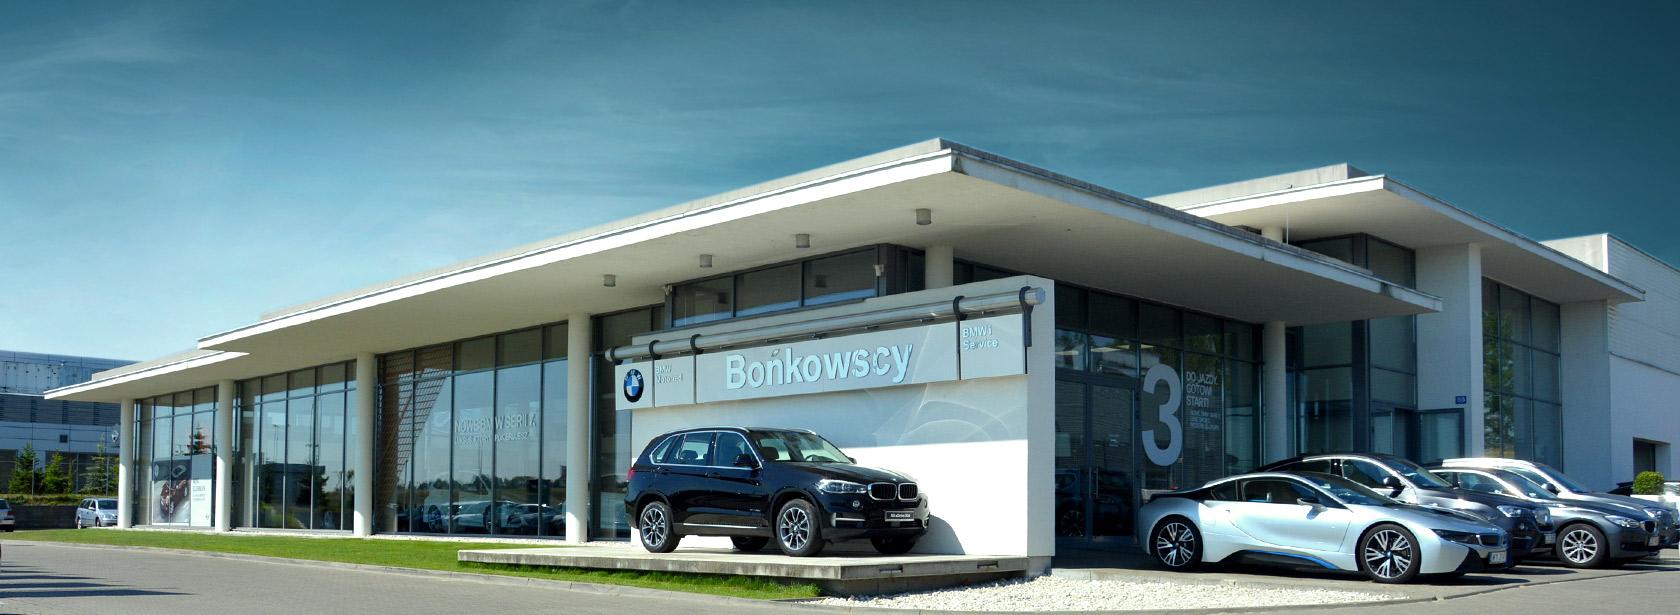 Salon Dealer BMW Bońkowscy.